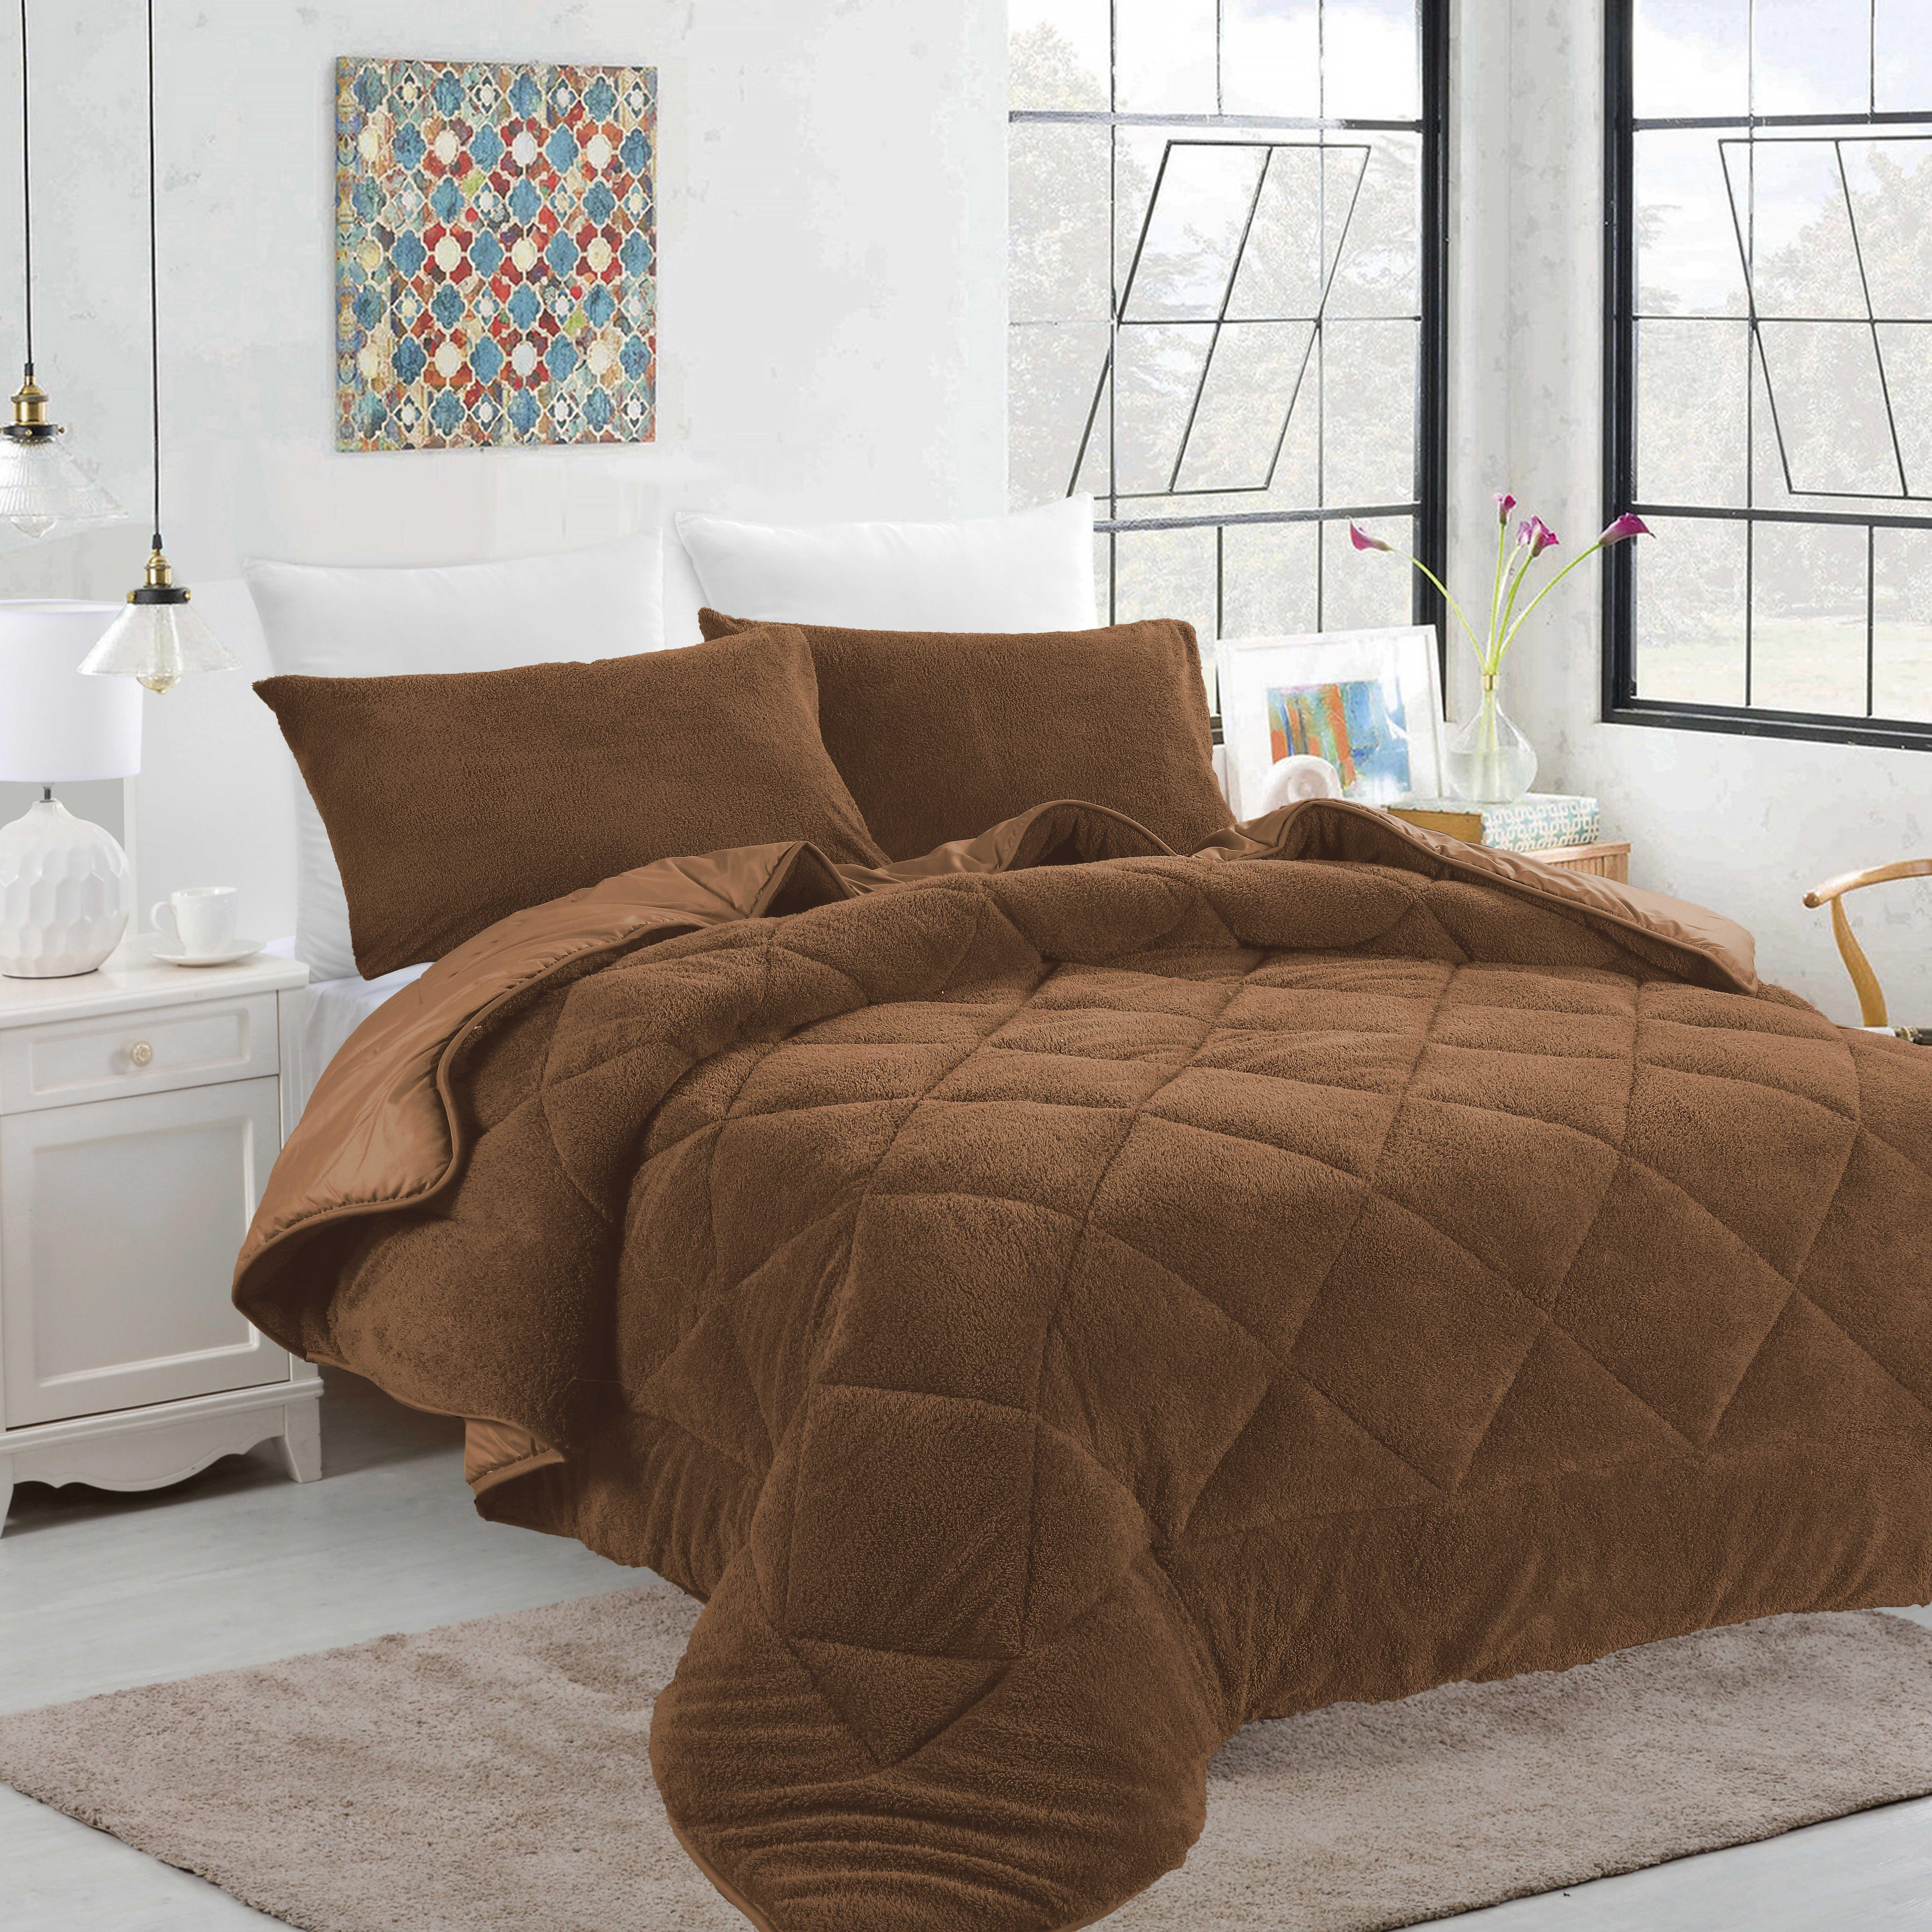 Ramesses Teddy Fleece Comforter Set